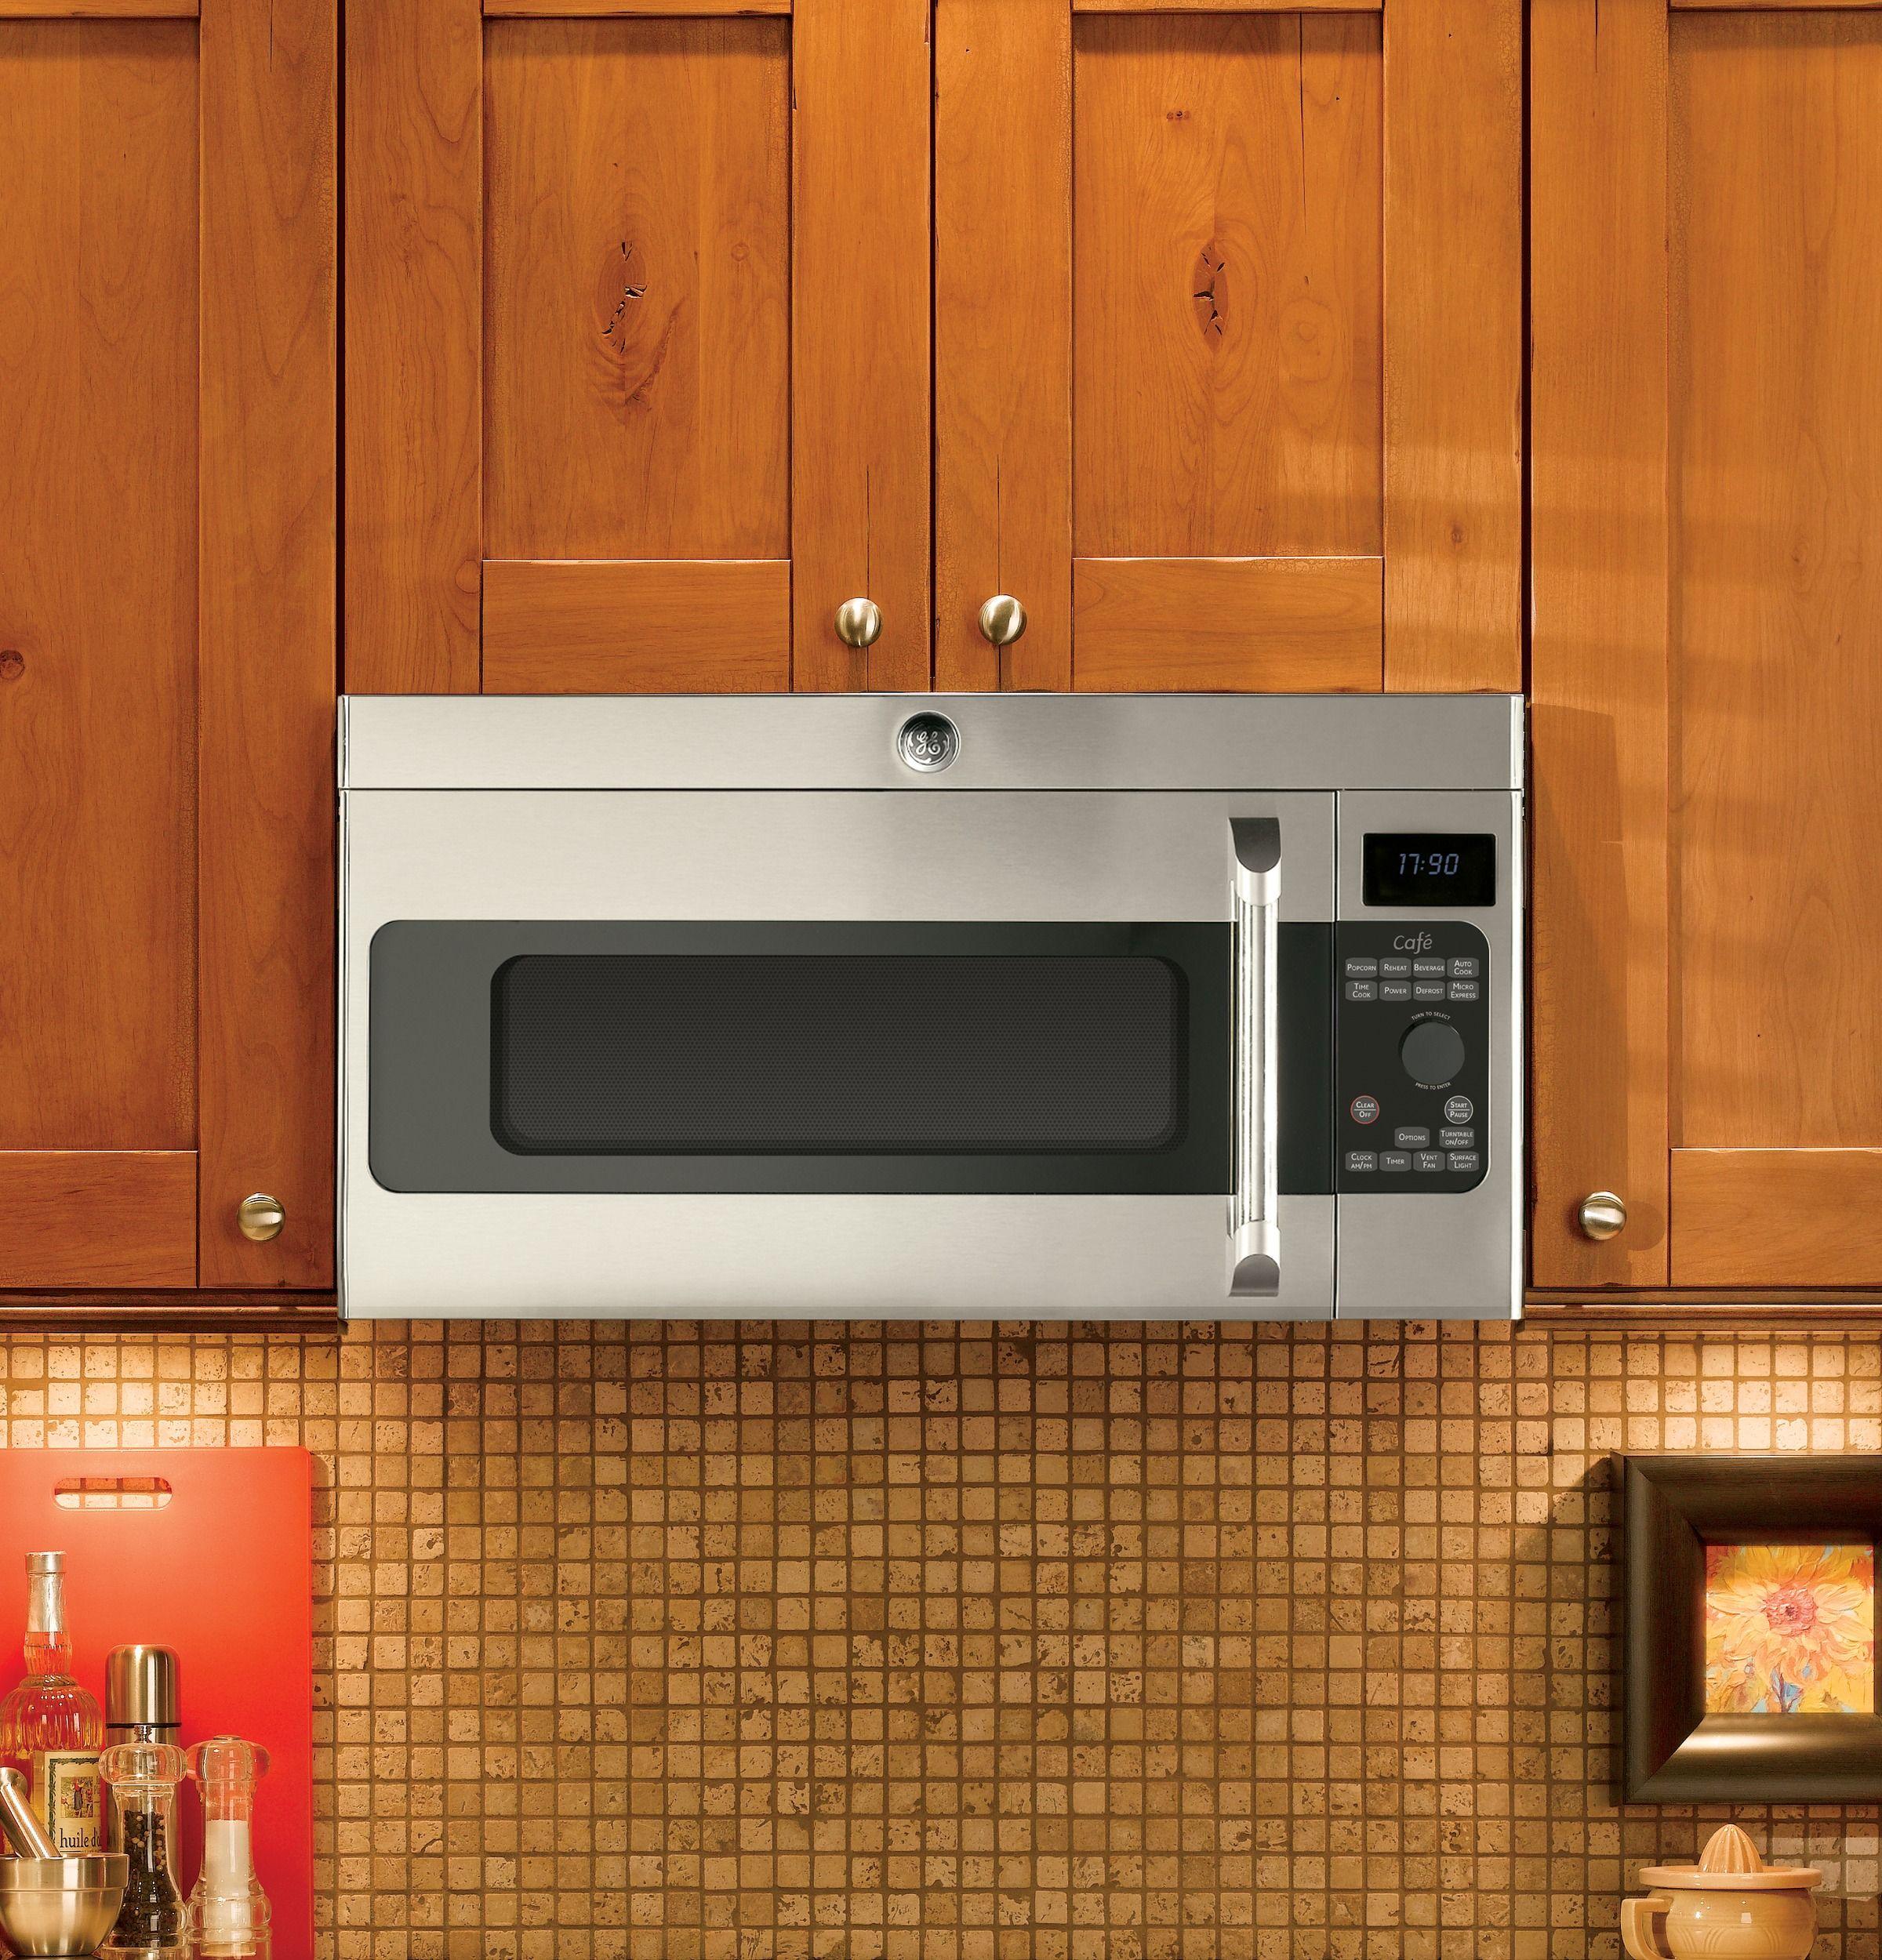 Cvm1750shss Ge Cafe Series 1 7 Cu Ft Over The Range Microwave Oven Ge Appliances Kitchen Built Ins Over The Range Microwaves Cabin Kitchens